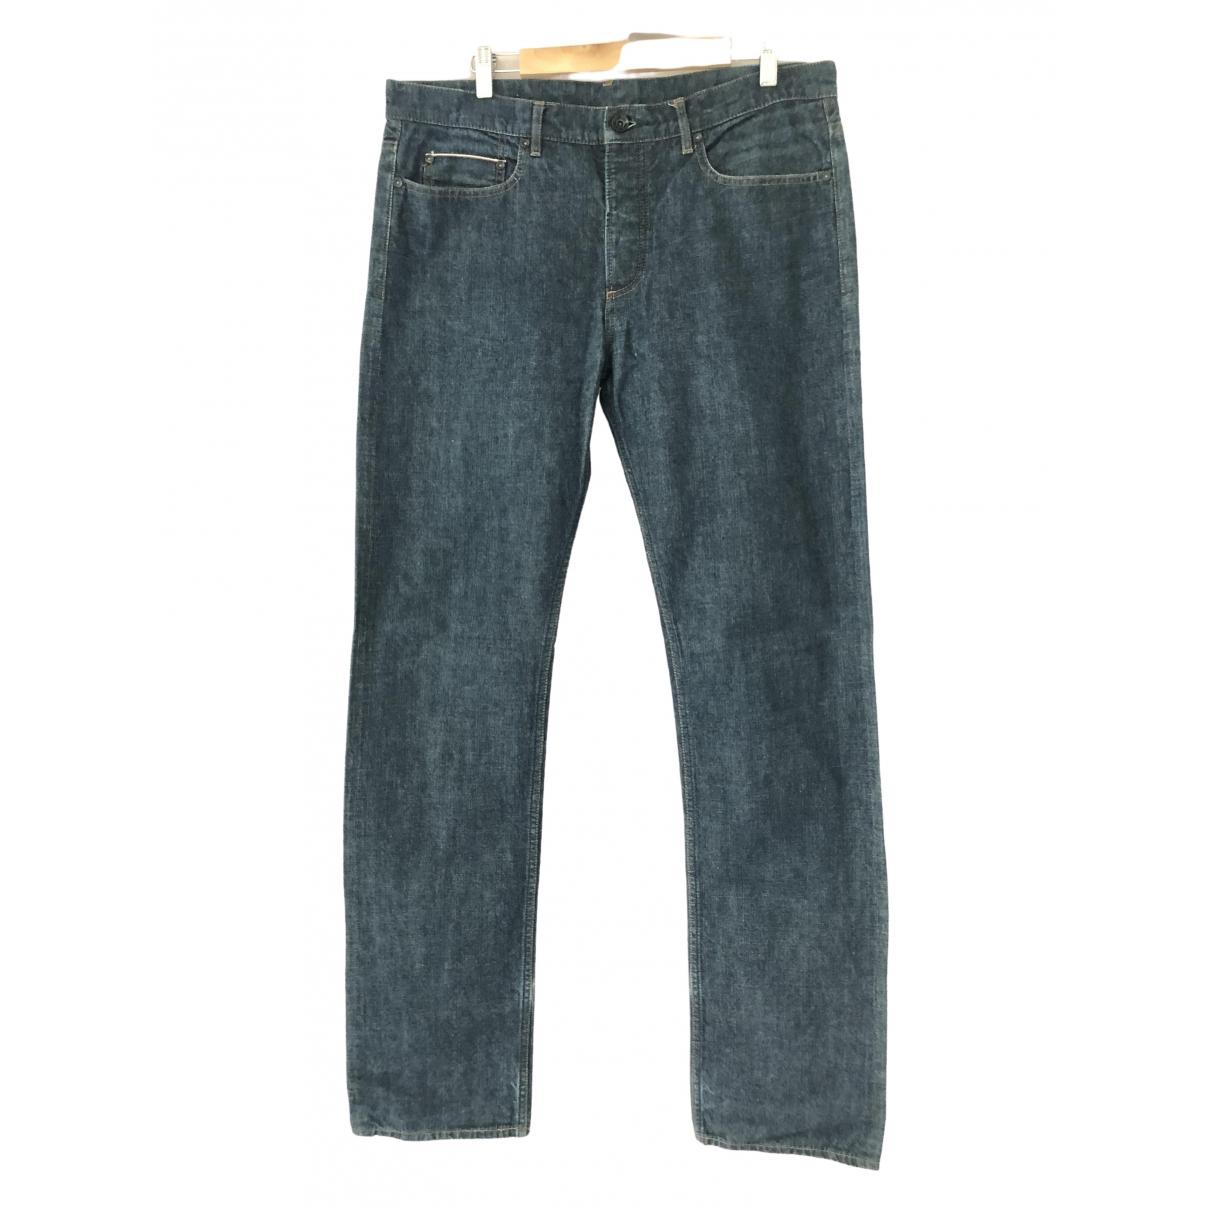 Giuliano Fujiwara \N Blue Cotton Jeans for Men 34 US